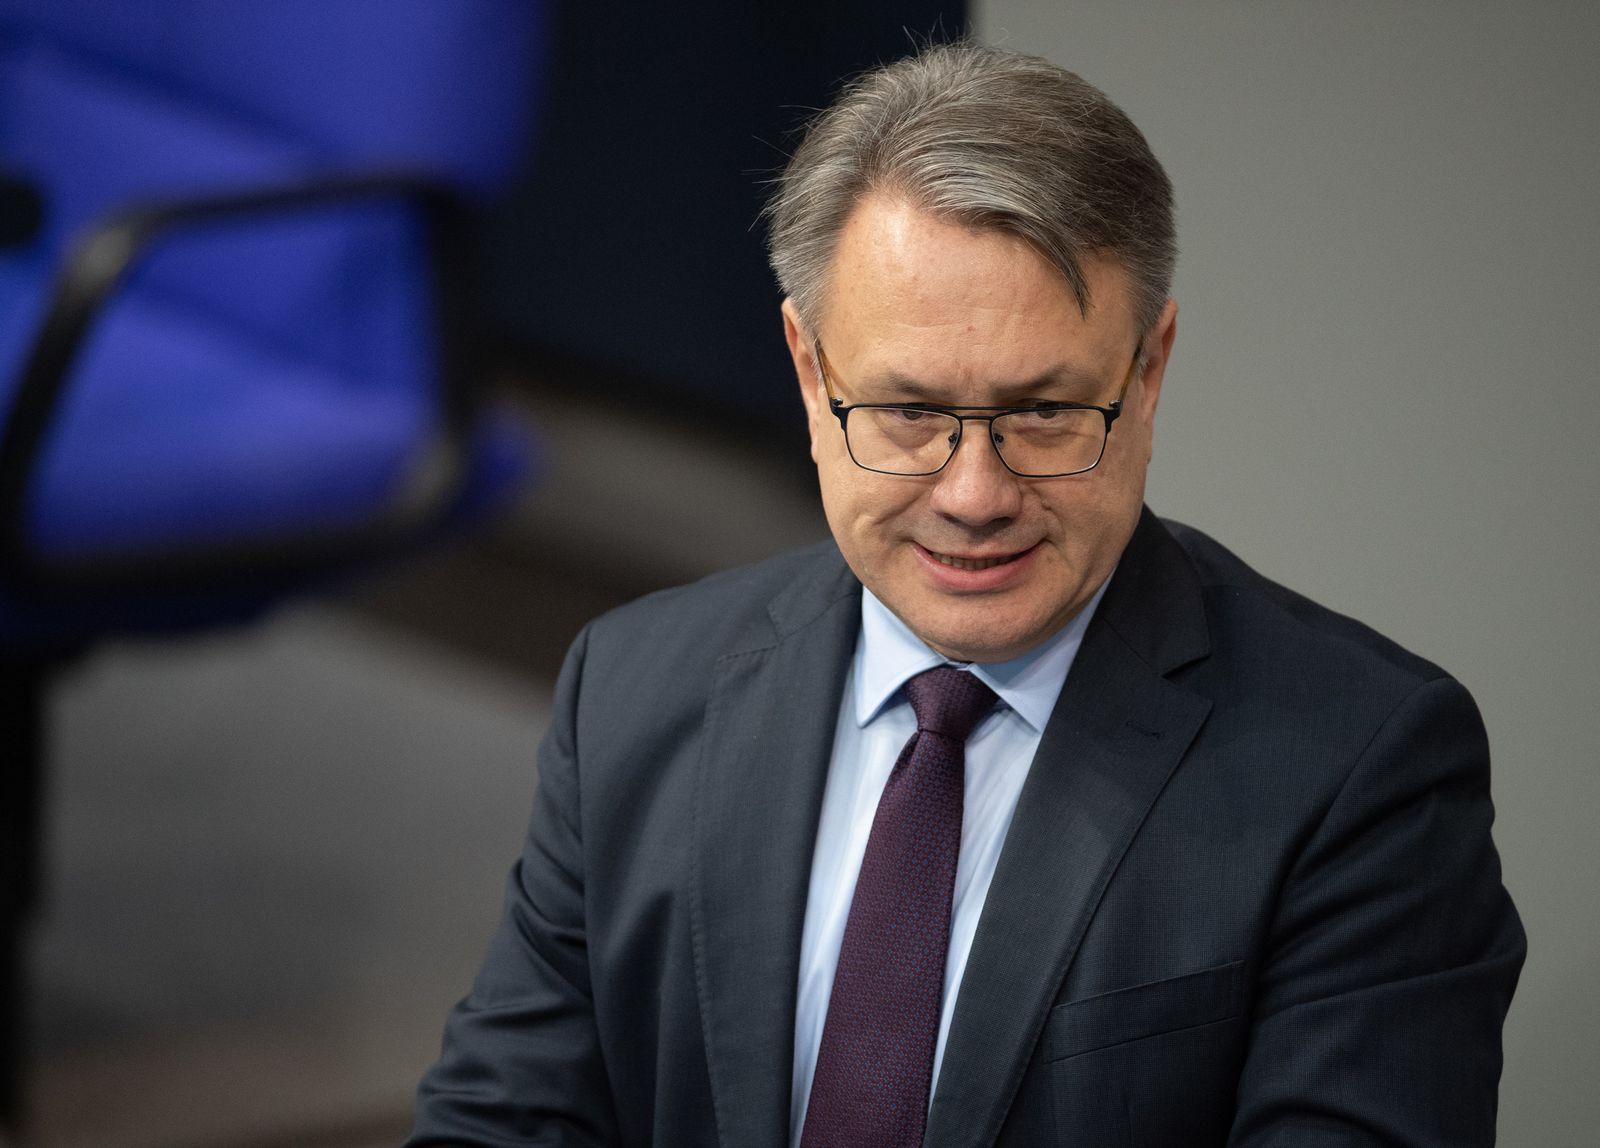 CSU-Abgeordneter Nüßlein